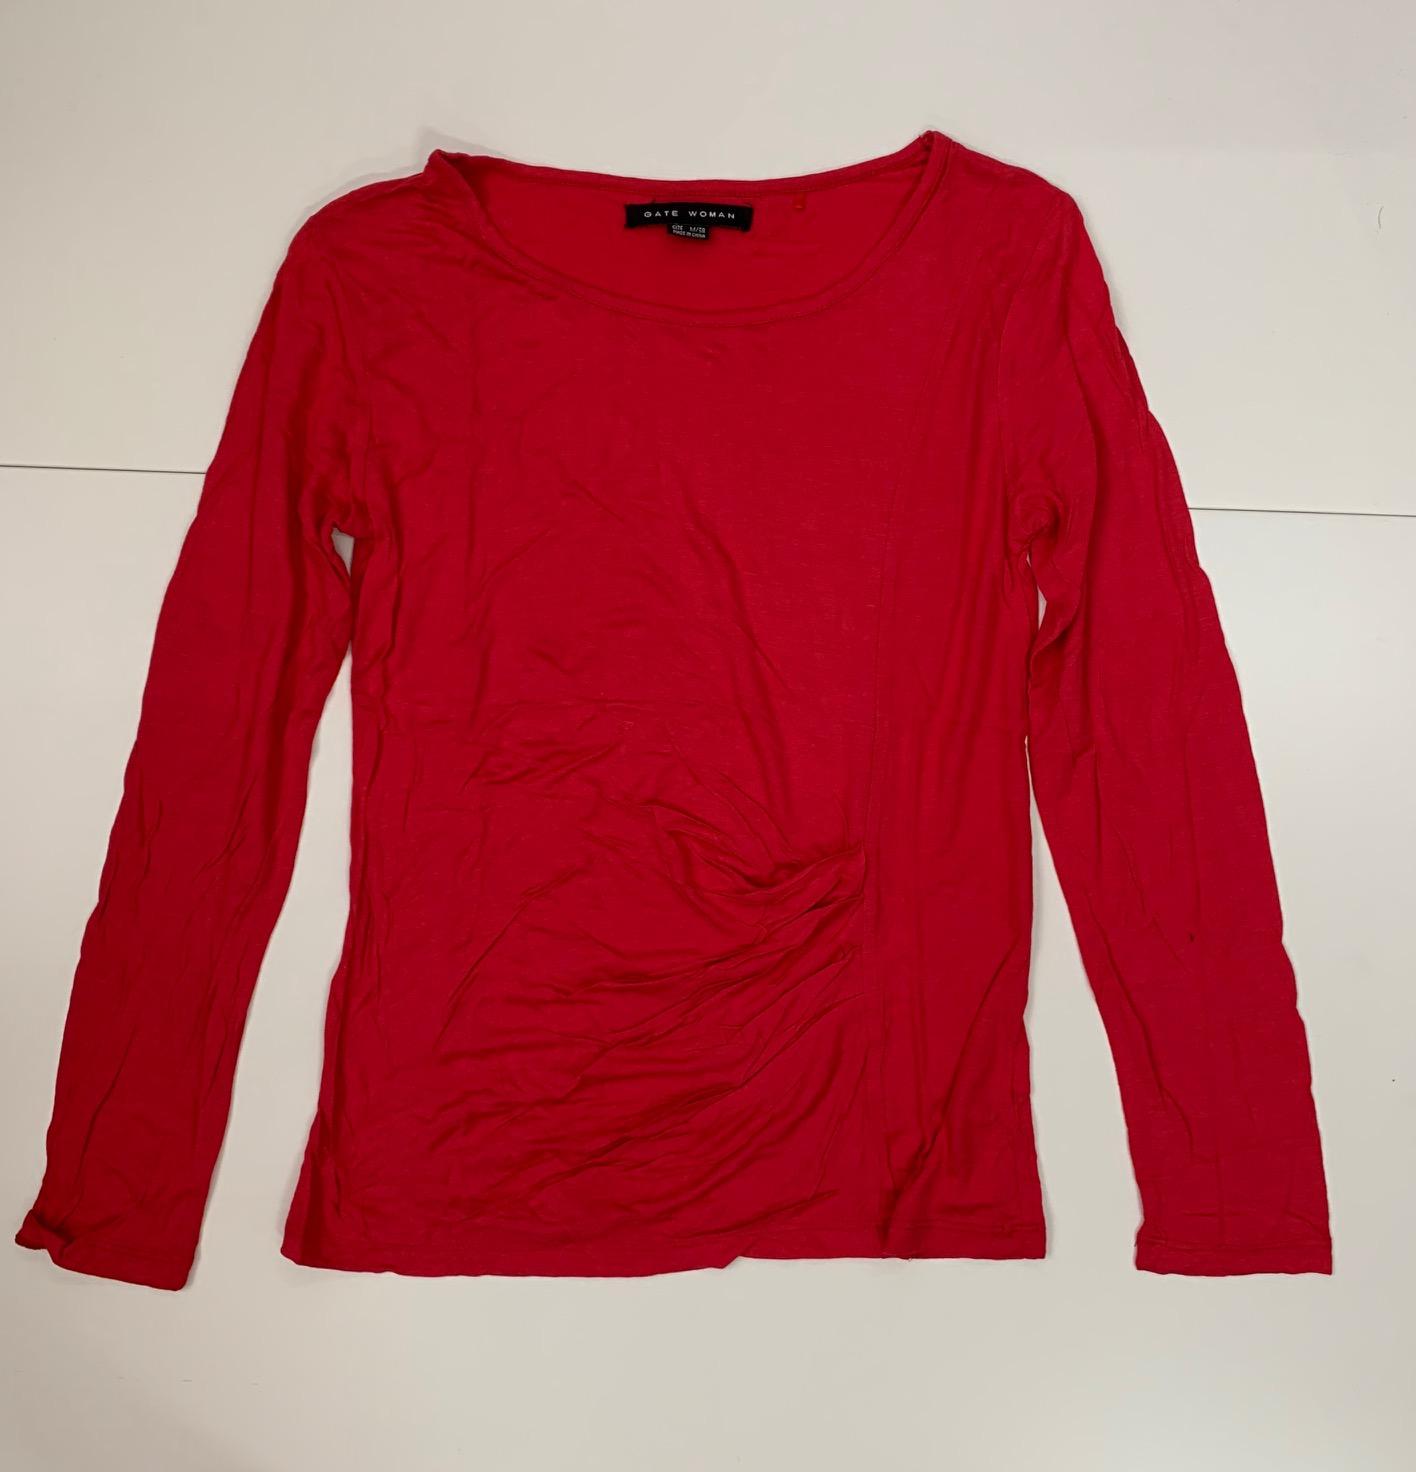 Красная женская кофточка от GATE WOMEN